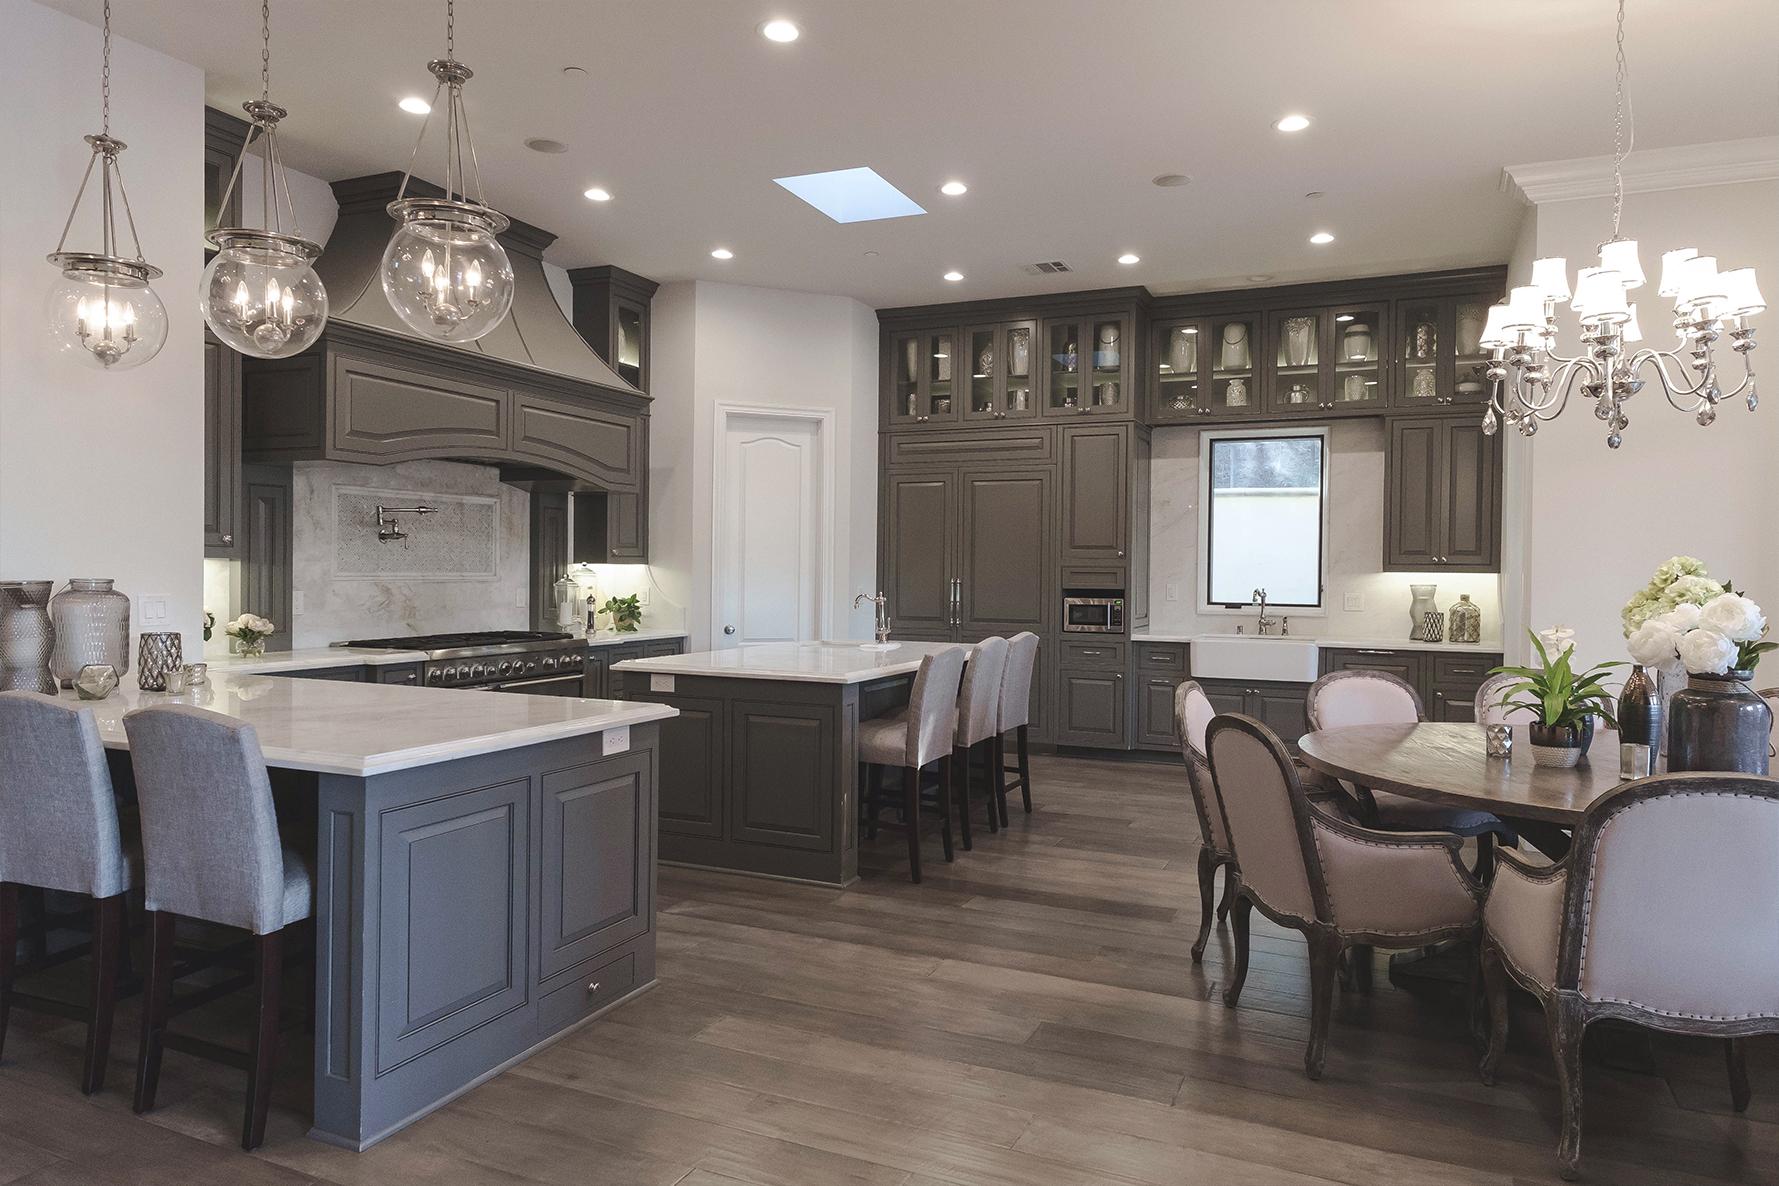 Orange County Kitchen Cabinets Jkid Project Casa Hacienda Glam Luxe Kitchen Haute